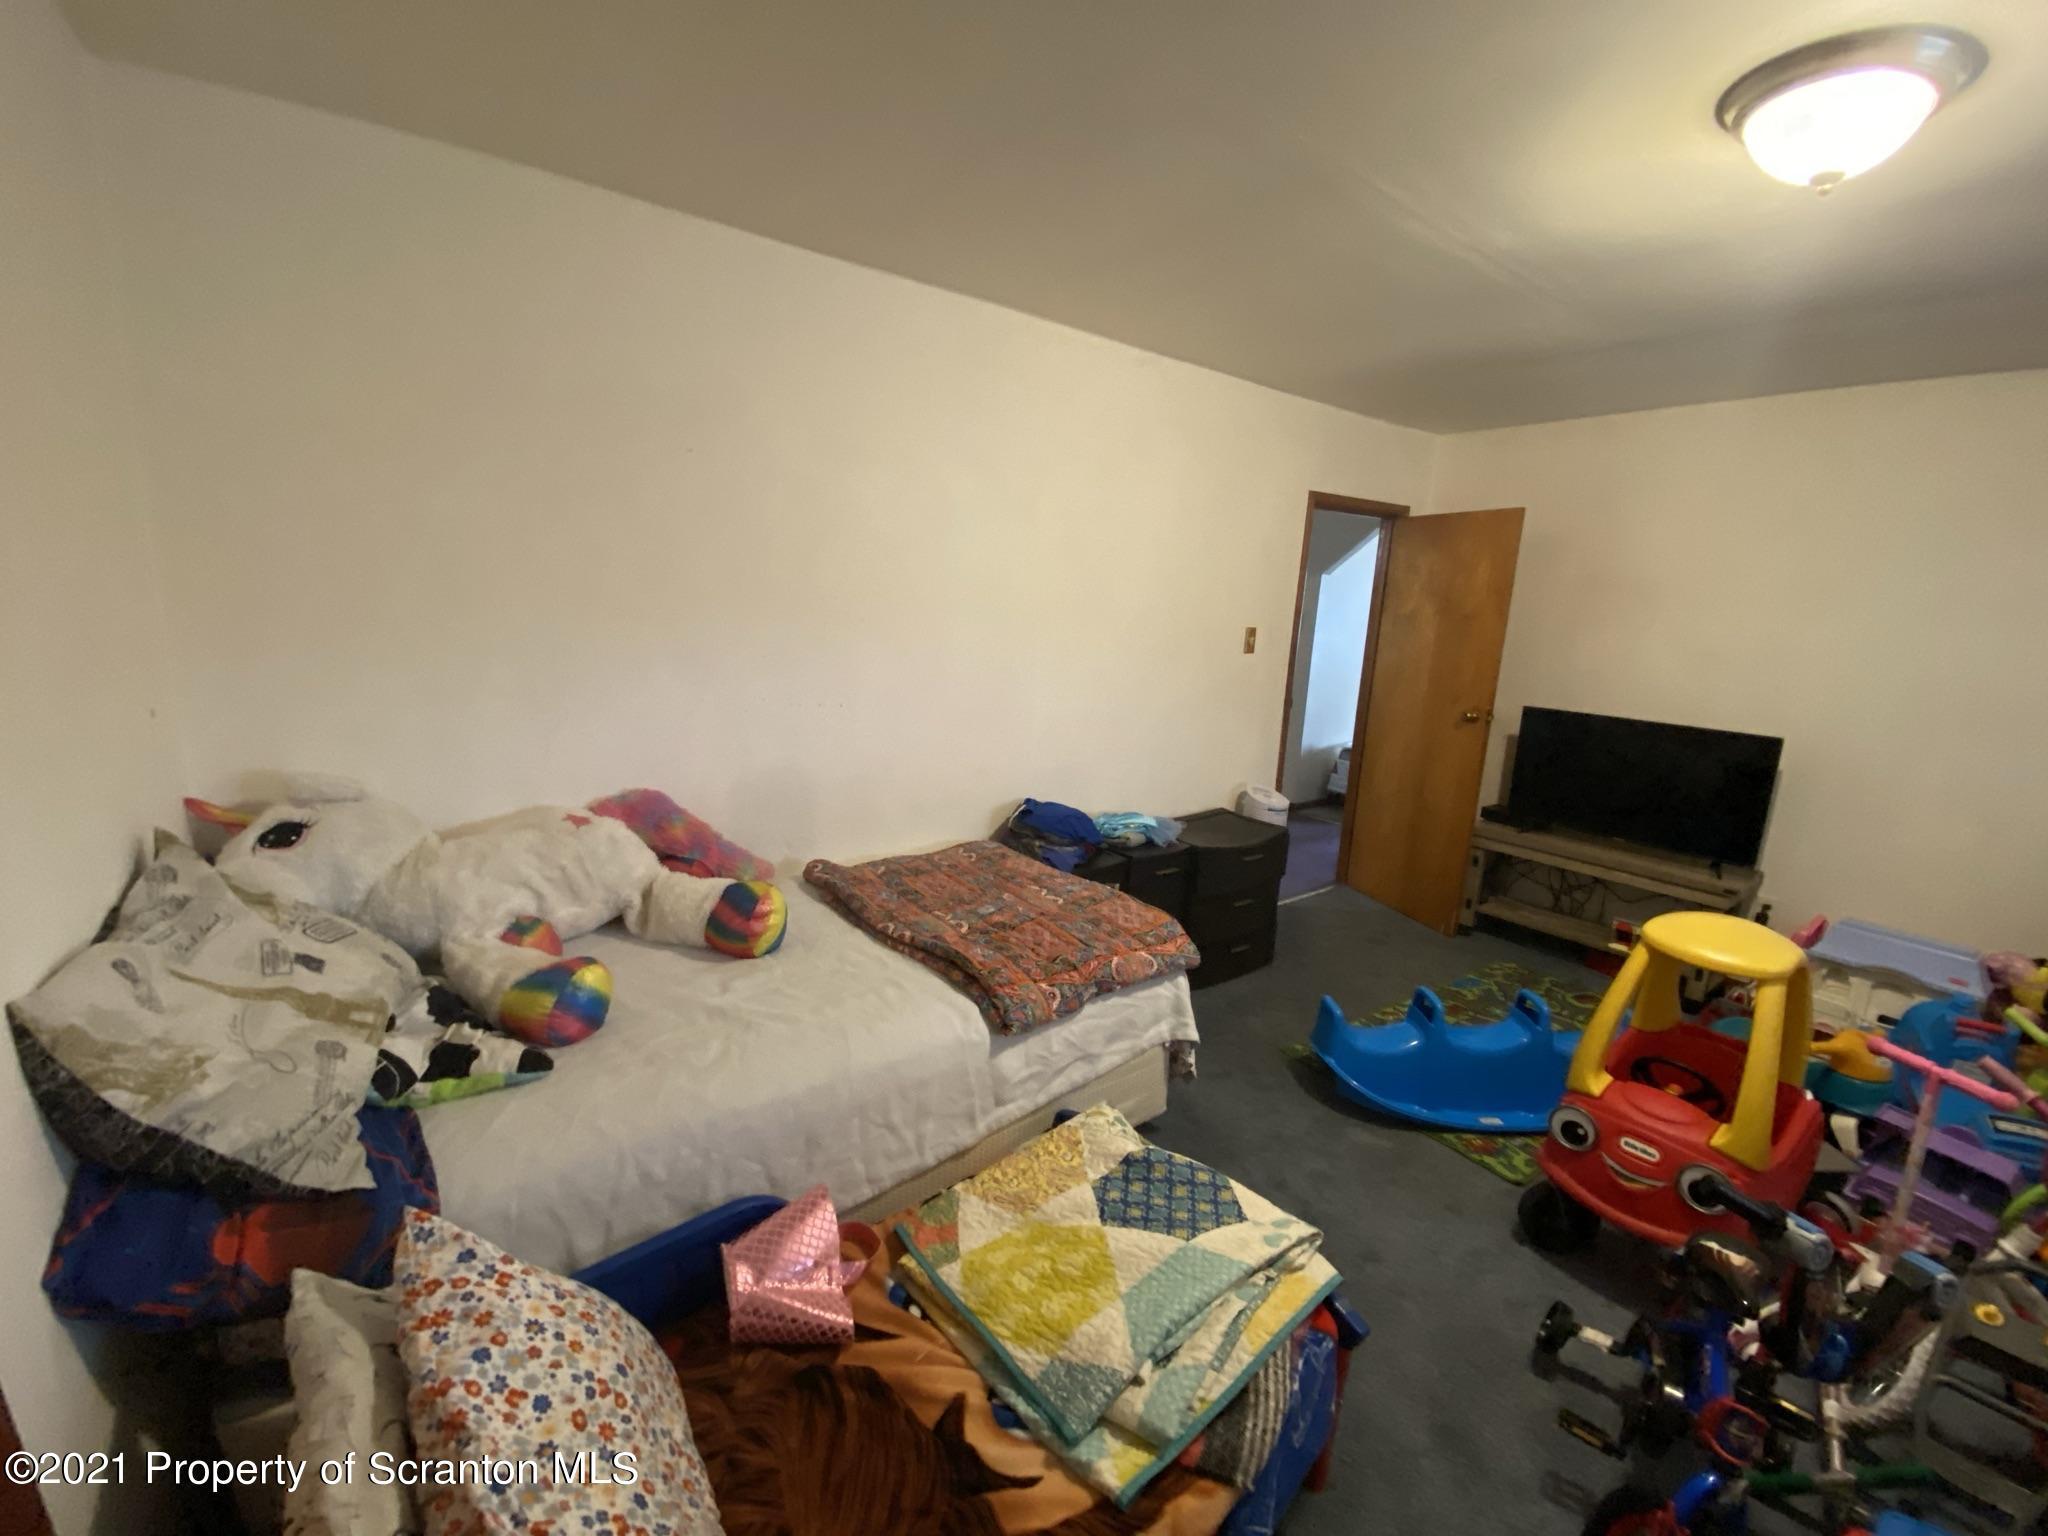 815 Meehan St, Dickson City, Pennsylvania 18519, 2 Bedrooms Bedrooms, 4 Rooms Rooms,1 BathroomBathrooms,Single Family,For Sale,Meehan,21-1181